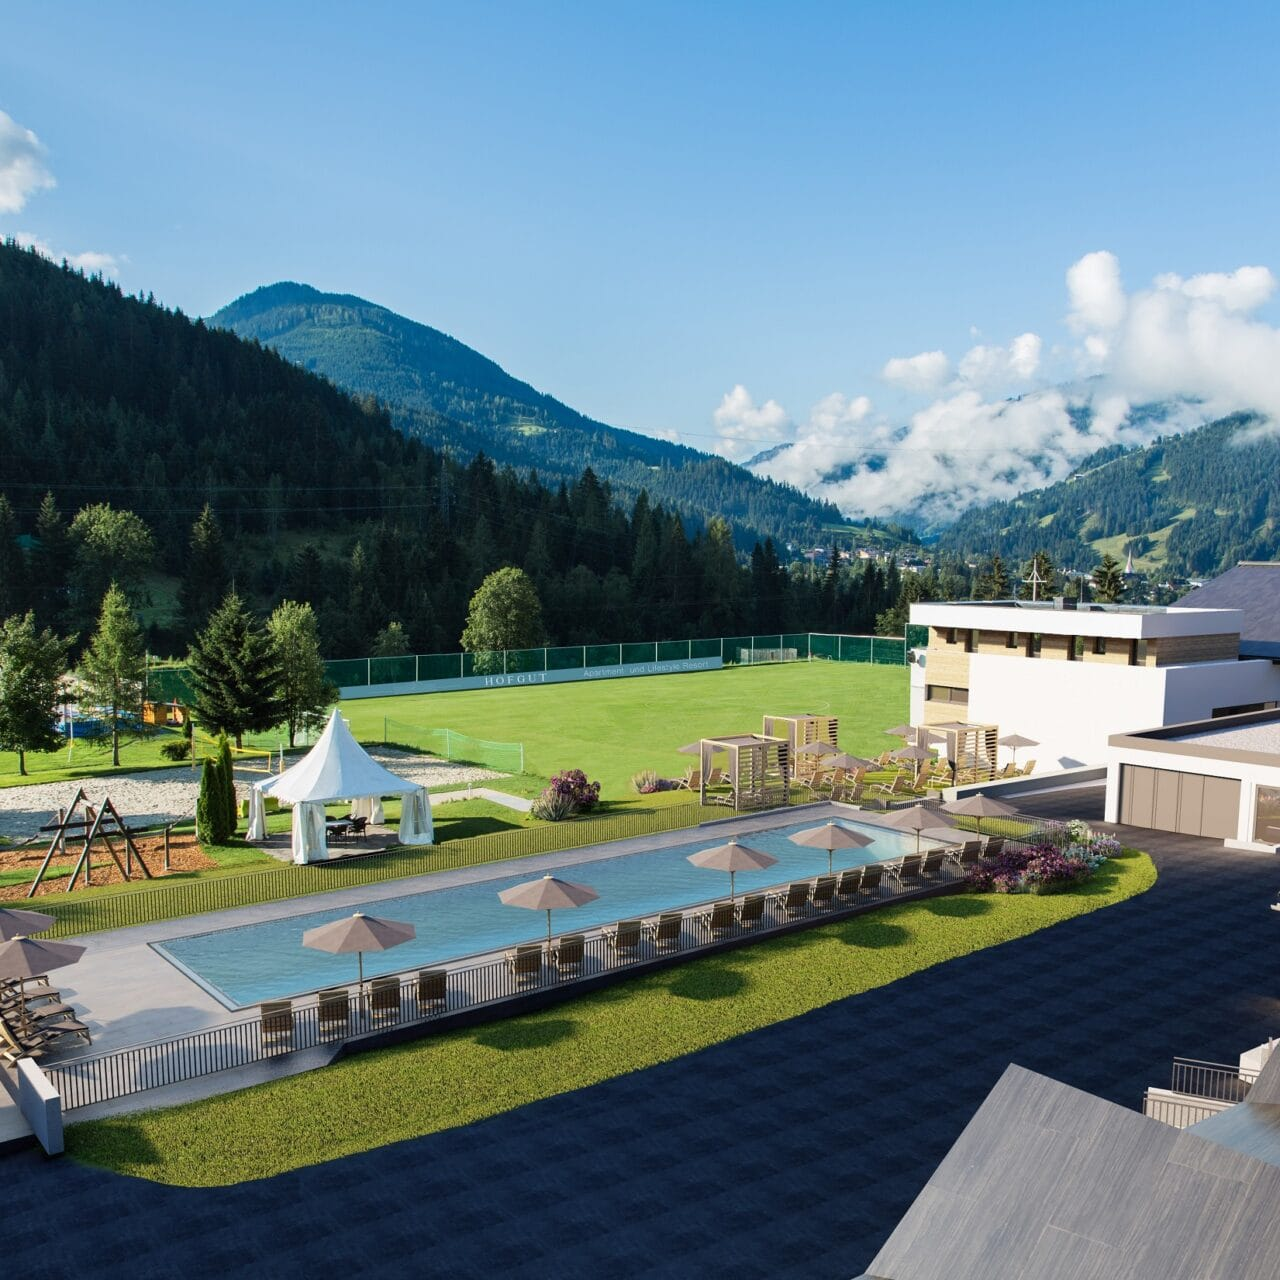 hofgut-apartment-lifestyle-resort-wagrain-erlebenimhofgut-außenanlage- poolblick-klein